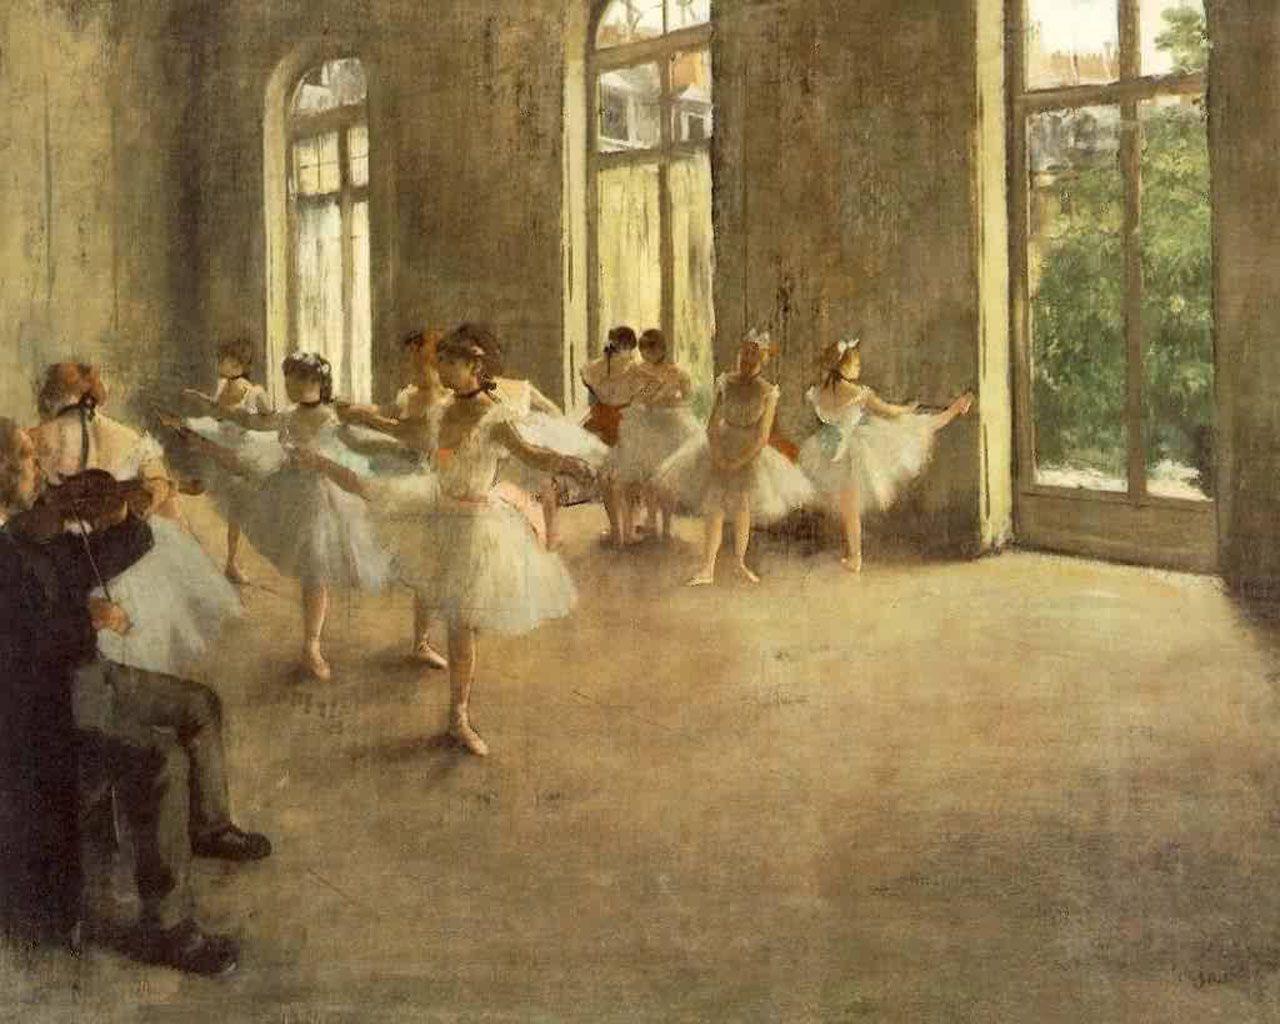 Репетиция, Эдгар Дега - Дега Эдгар  ( Edgar Degas ) фото